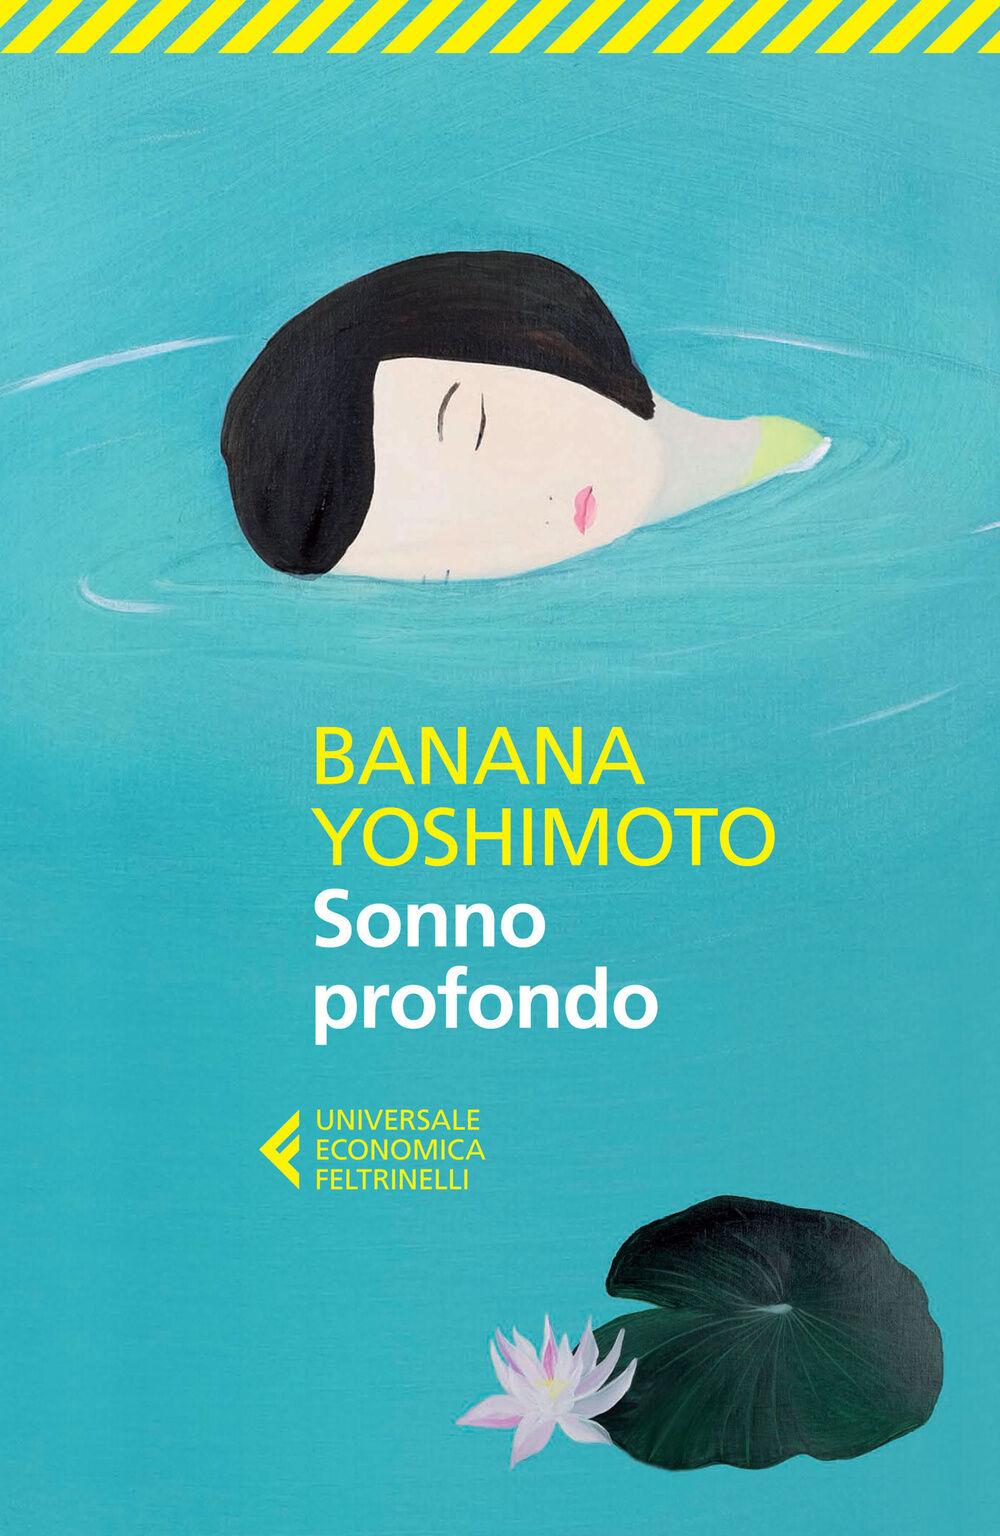 Sonno profondo banana yoshimoto libro feltrinelli universale economica ibs - Il giardino segreto banana yoshimoto ...